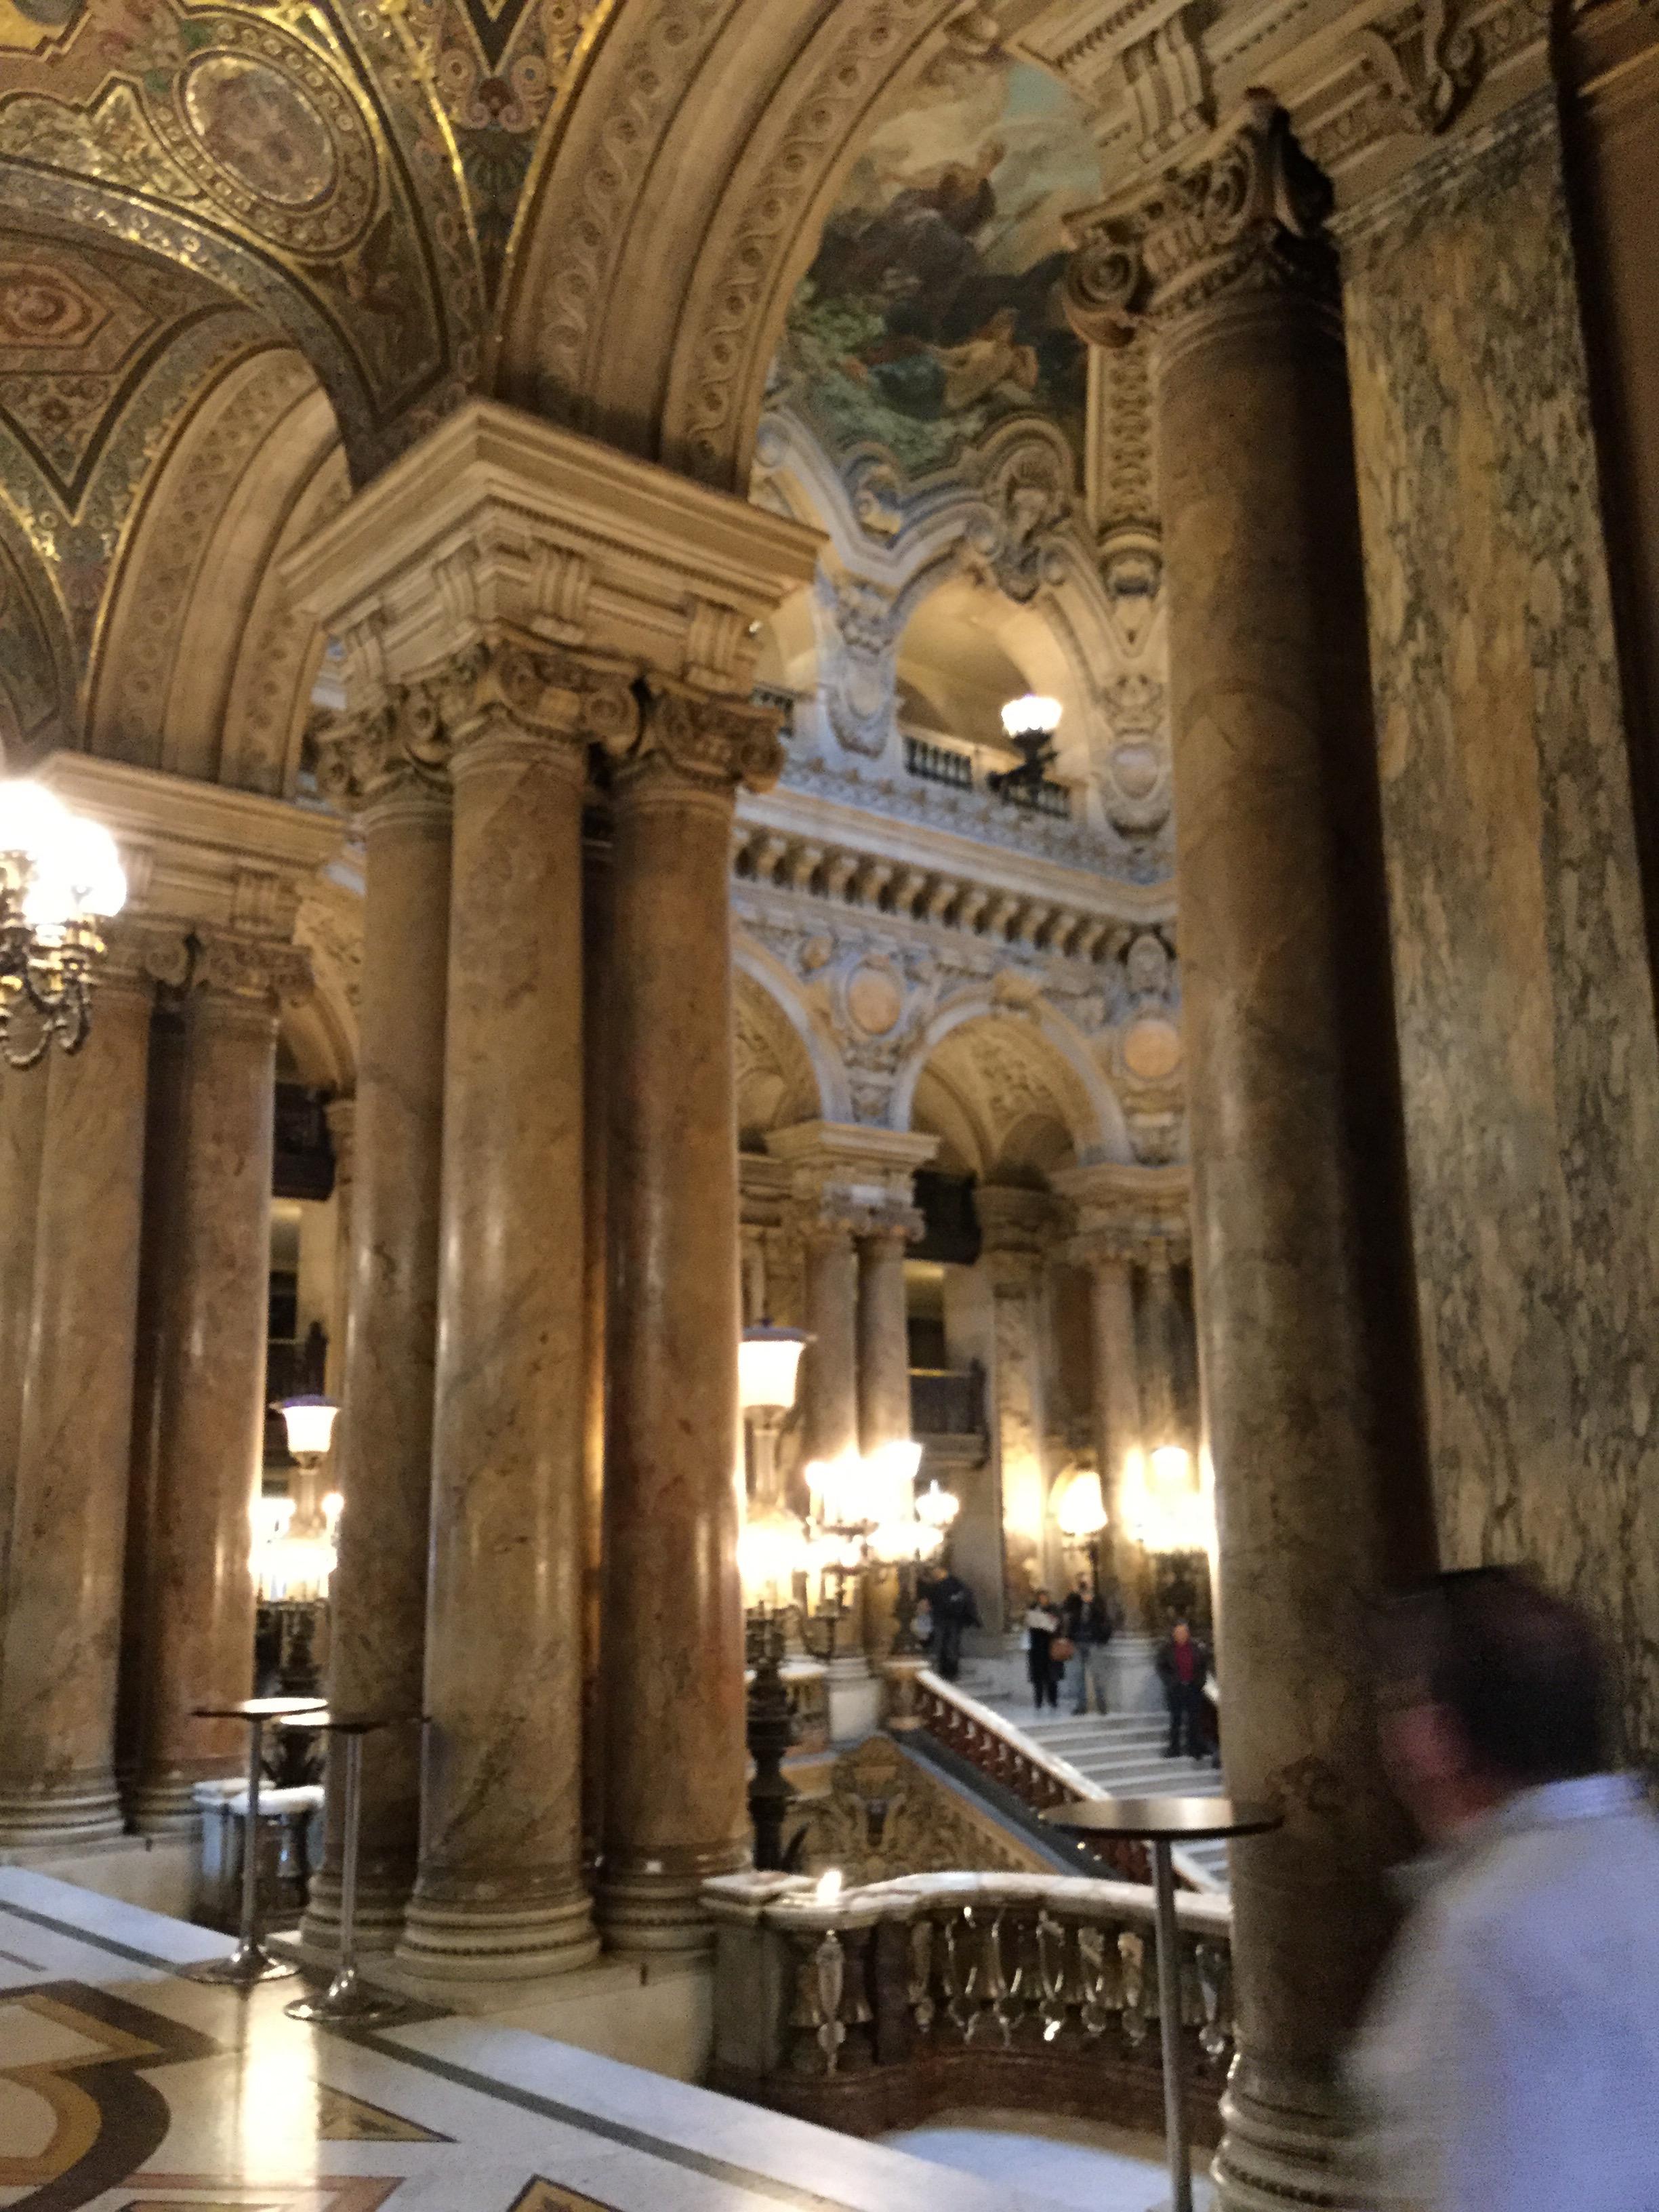 The Grand Escalier